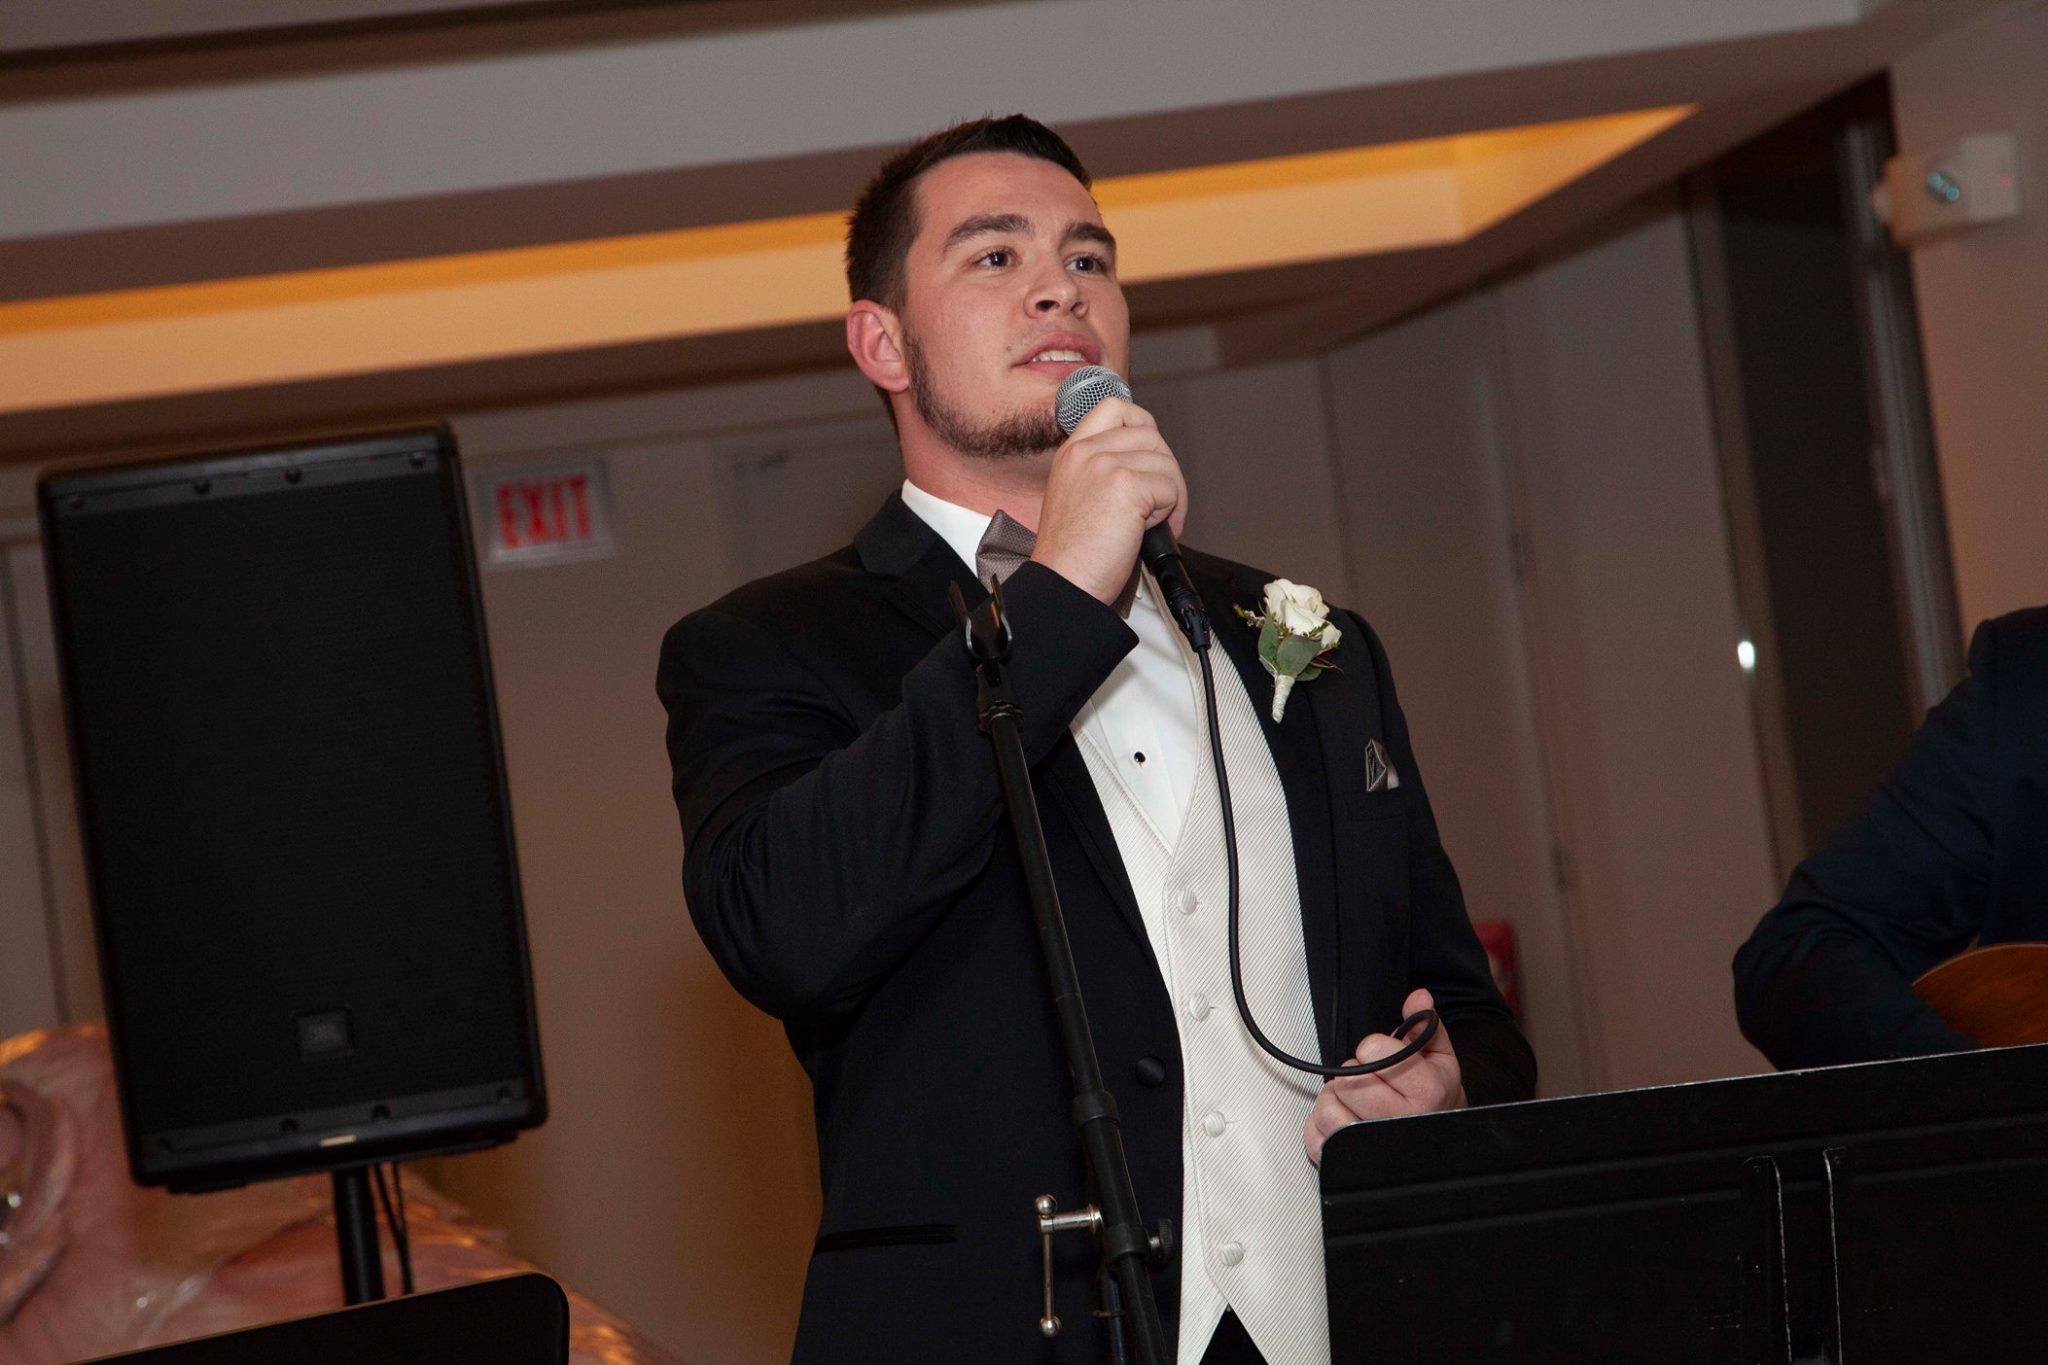 Singing Dean Martin @ sister's wedding